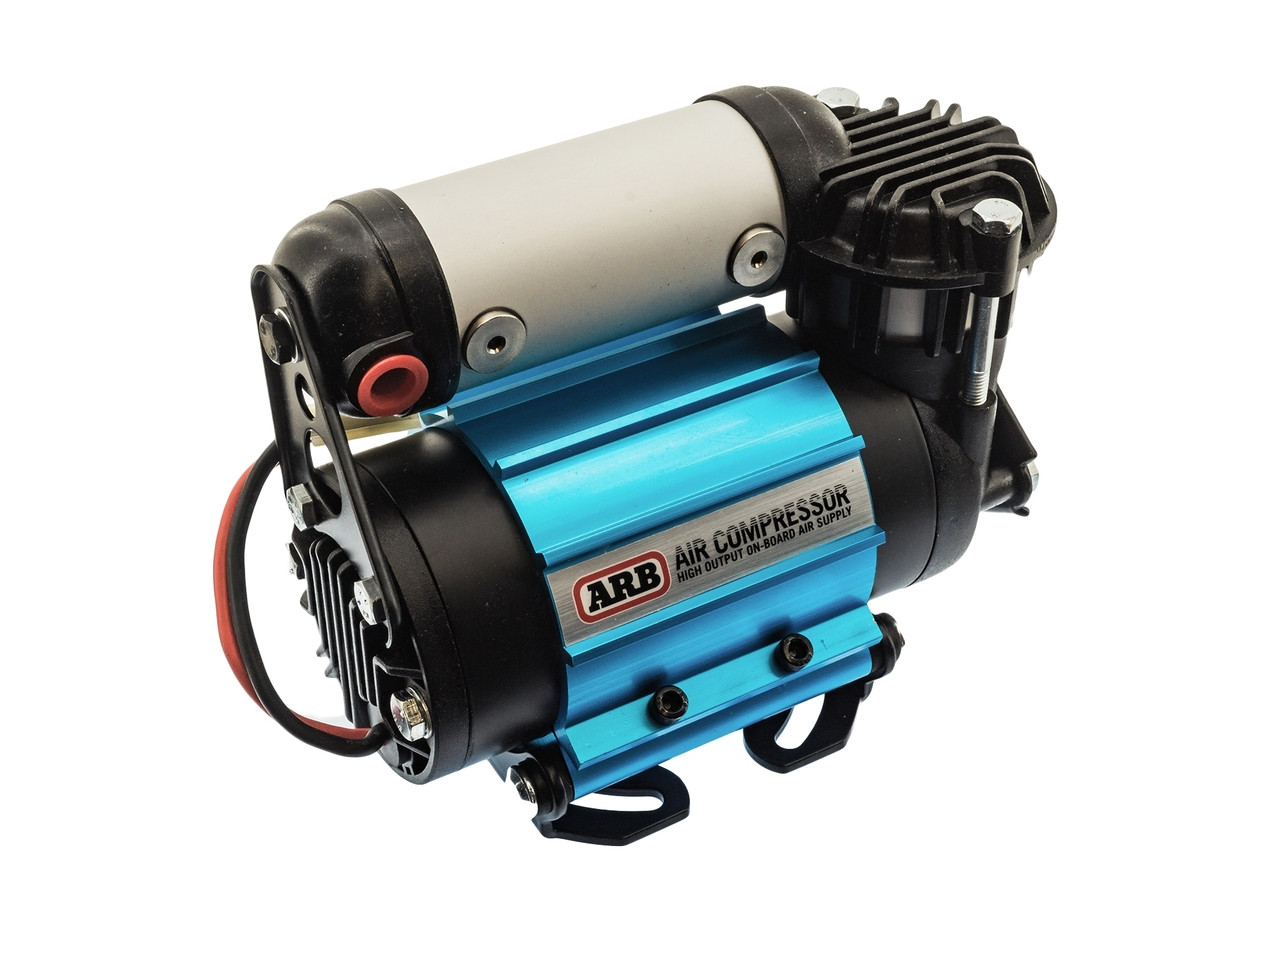 ARB CKSA12 Compressor for Air Lockers